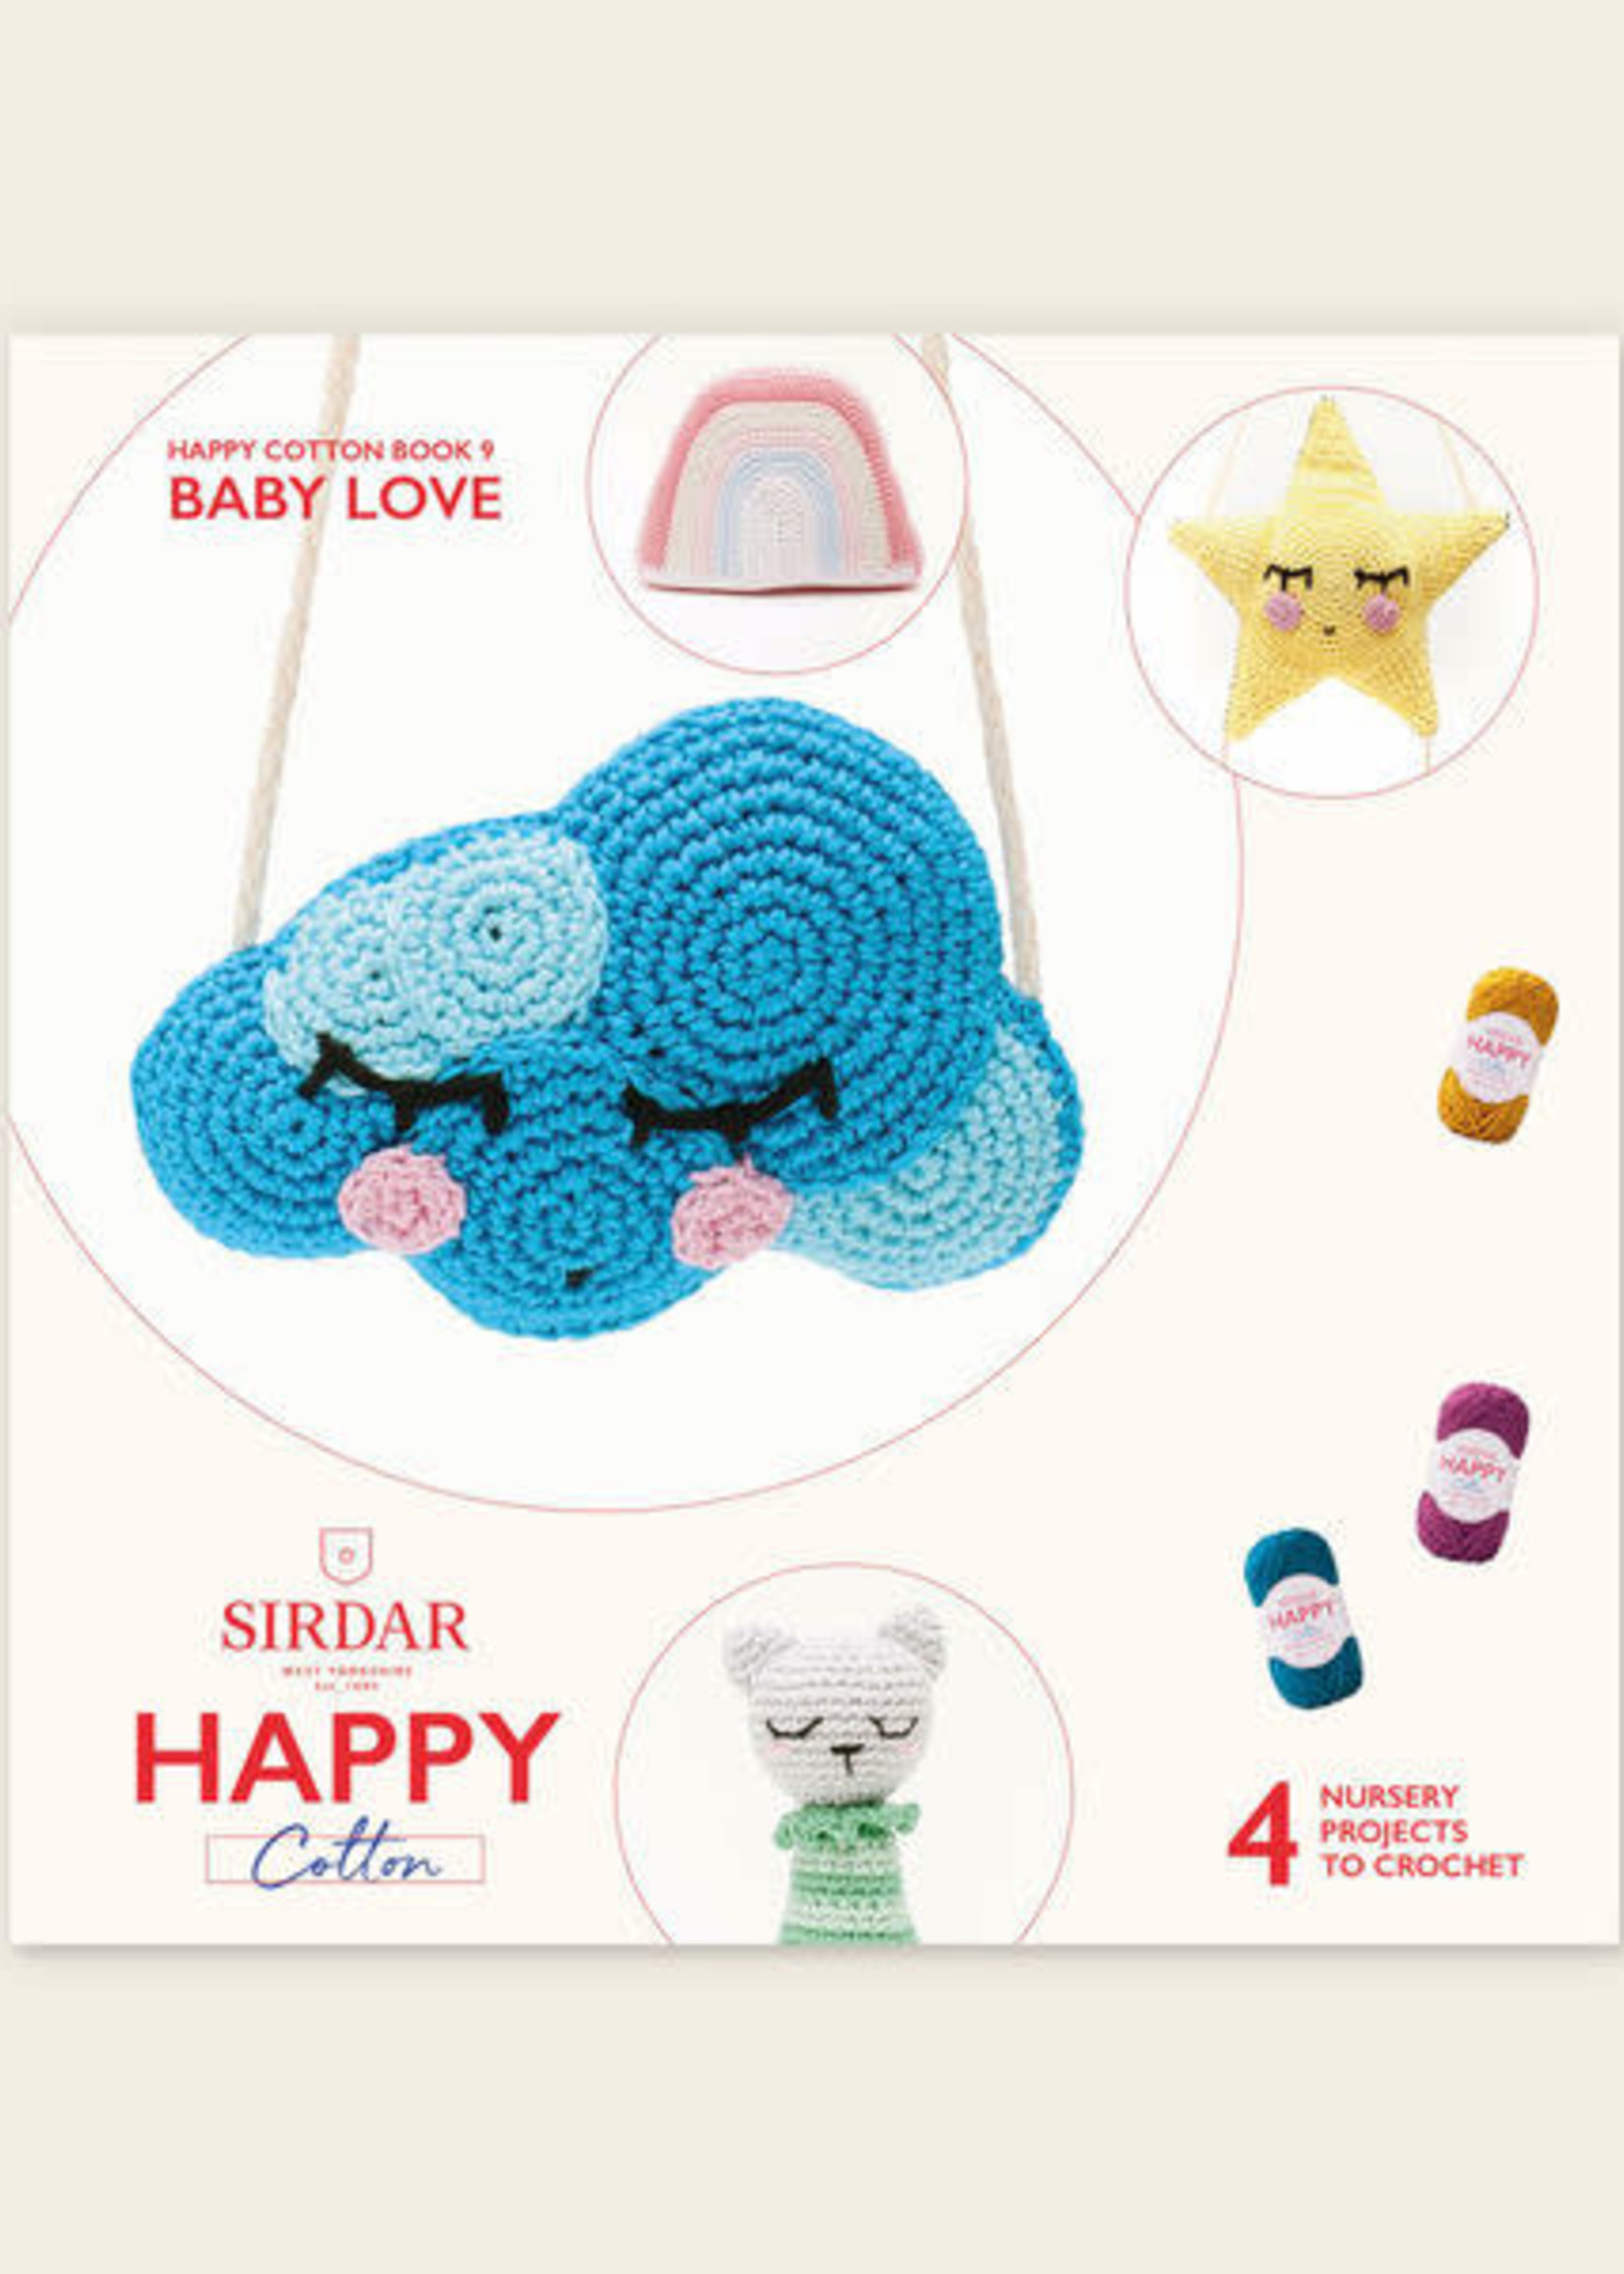 Sirdar Sirdar Happy Cotton Book 9 Baby Love